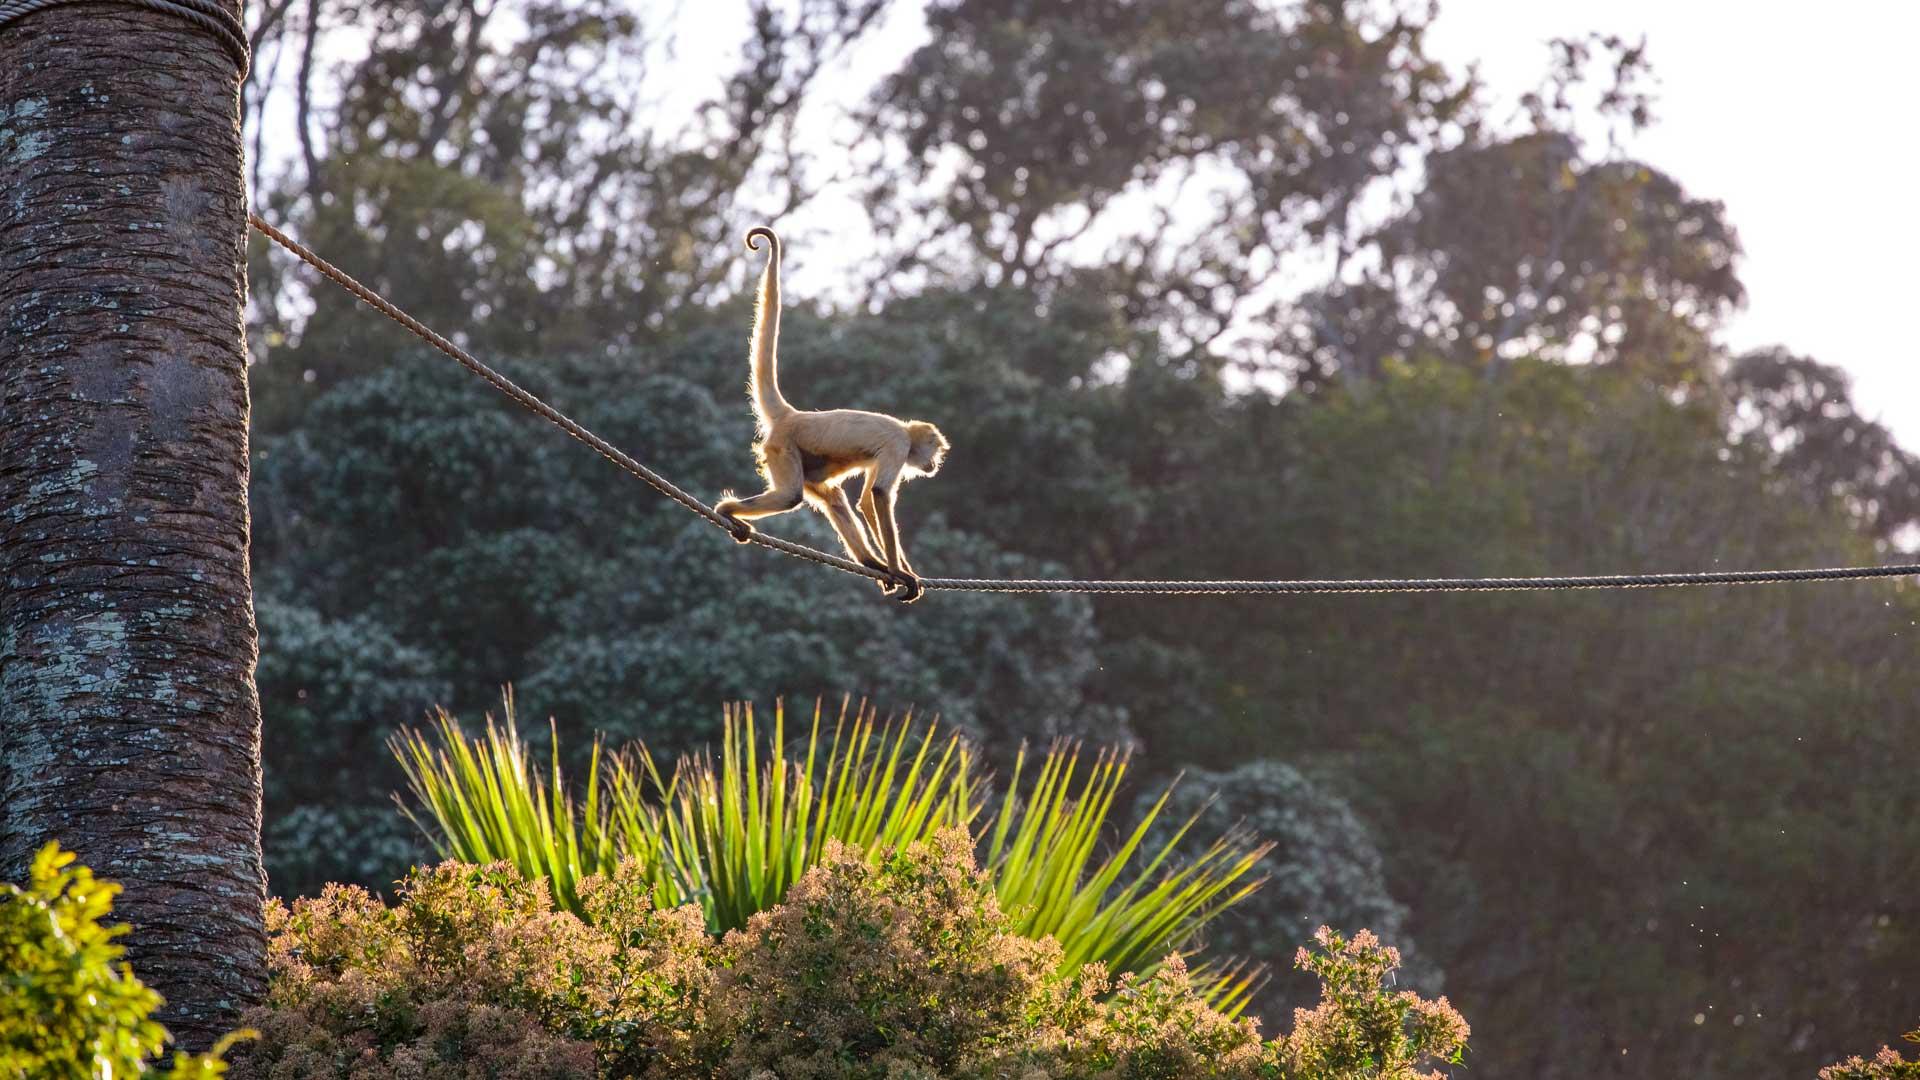 https://rfacdn.nz/zoo/assets/media/spider-monkey-gallery-5.jpg